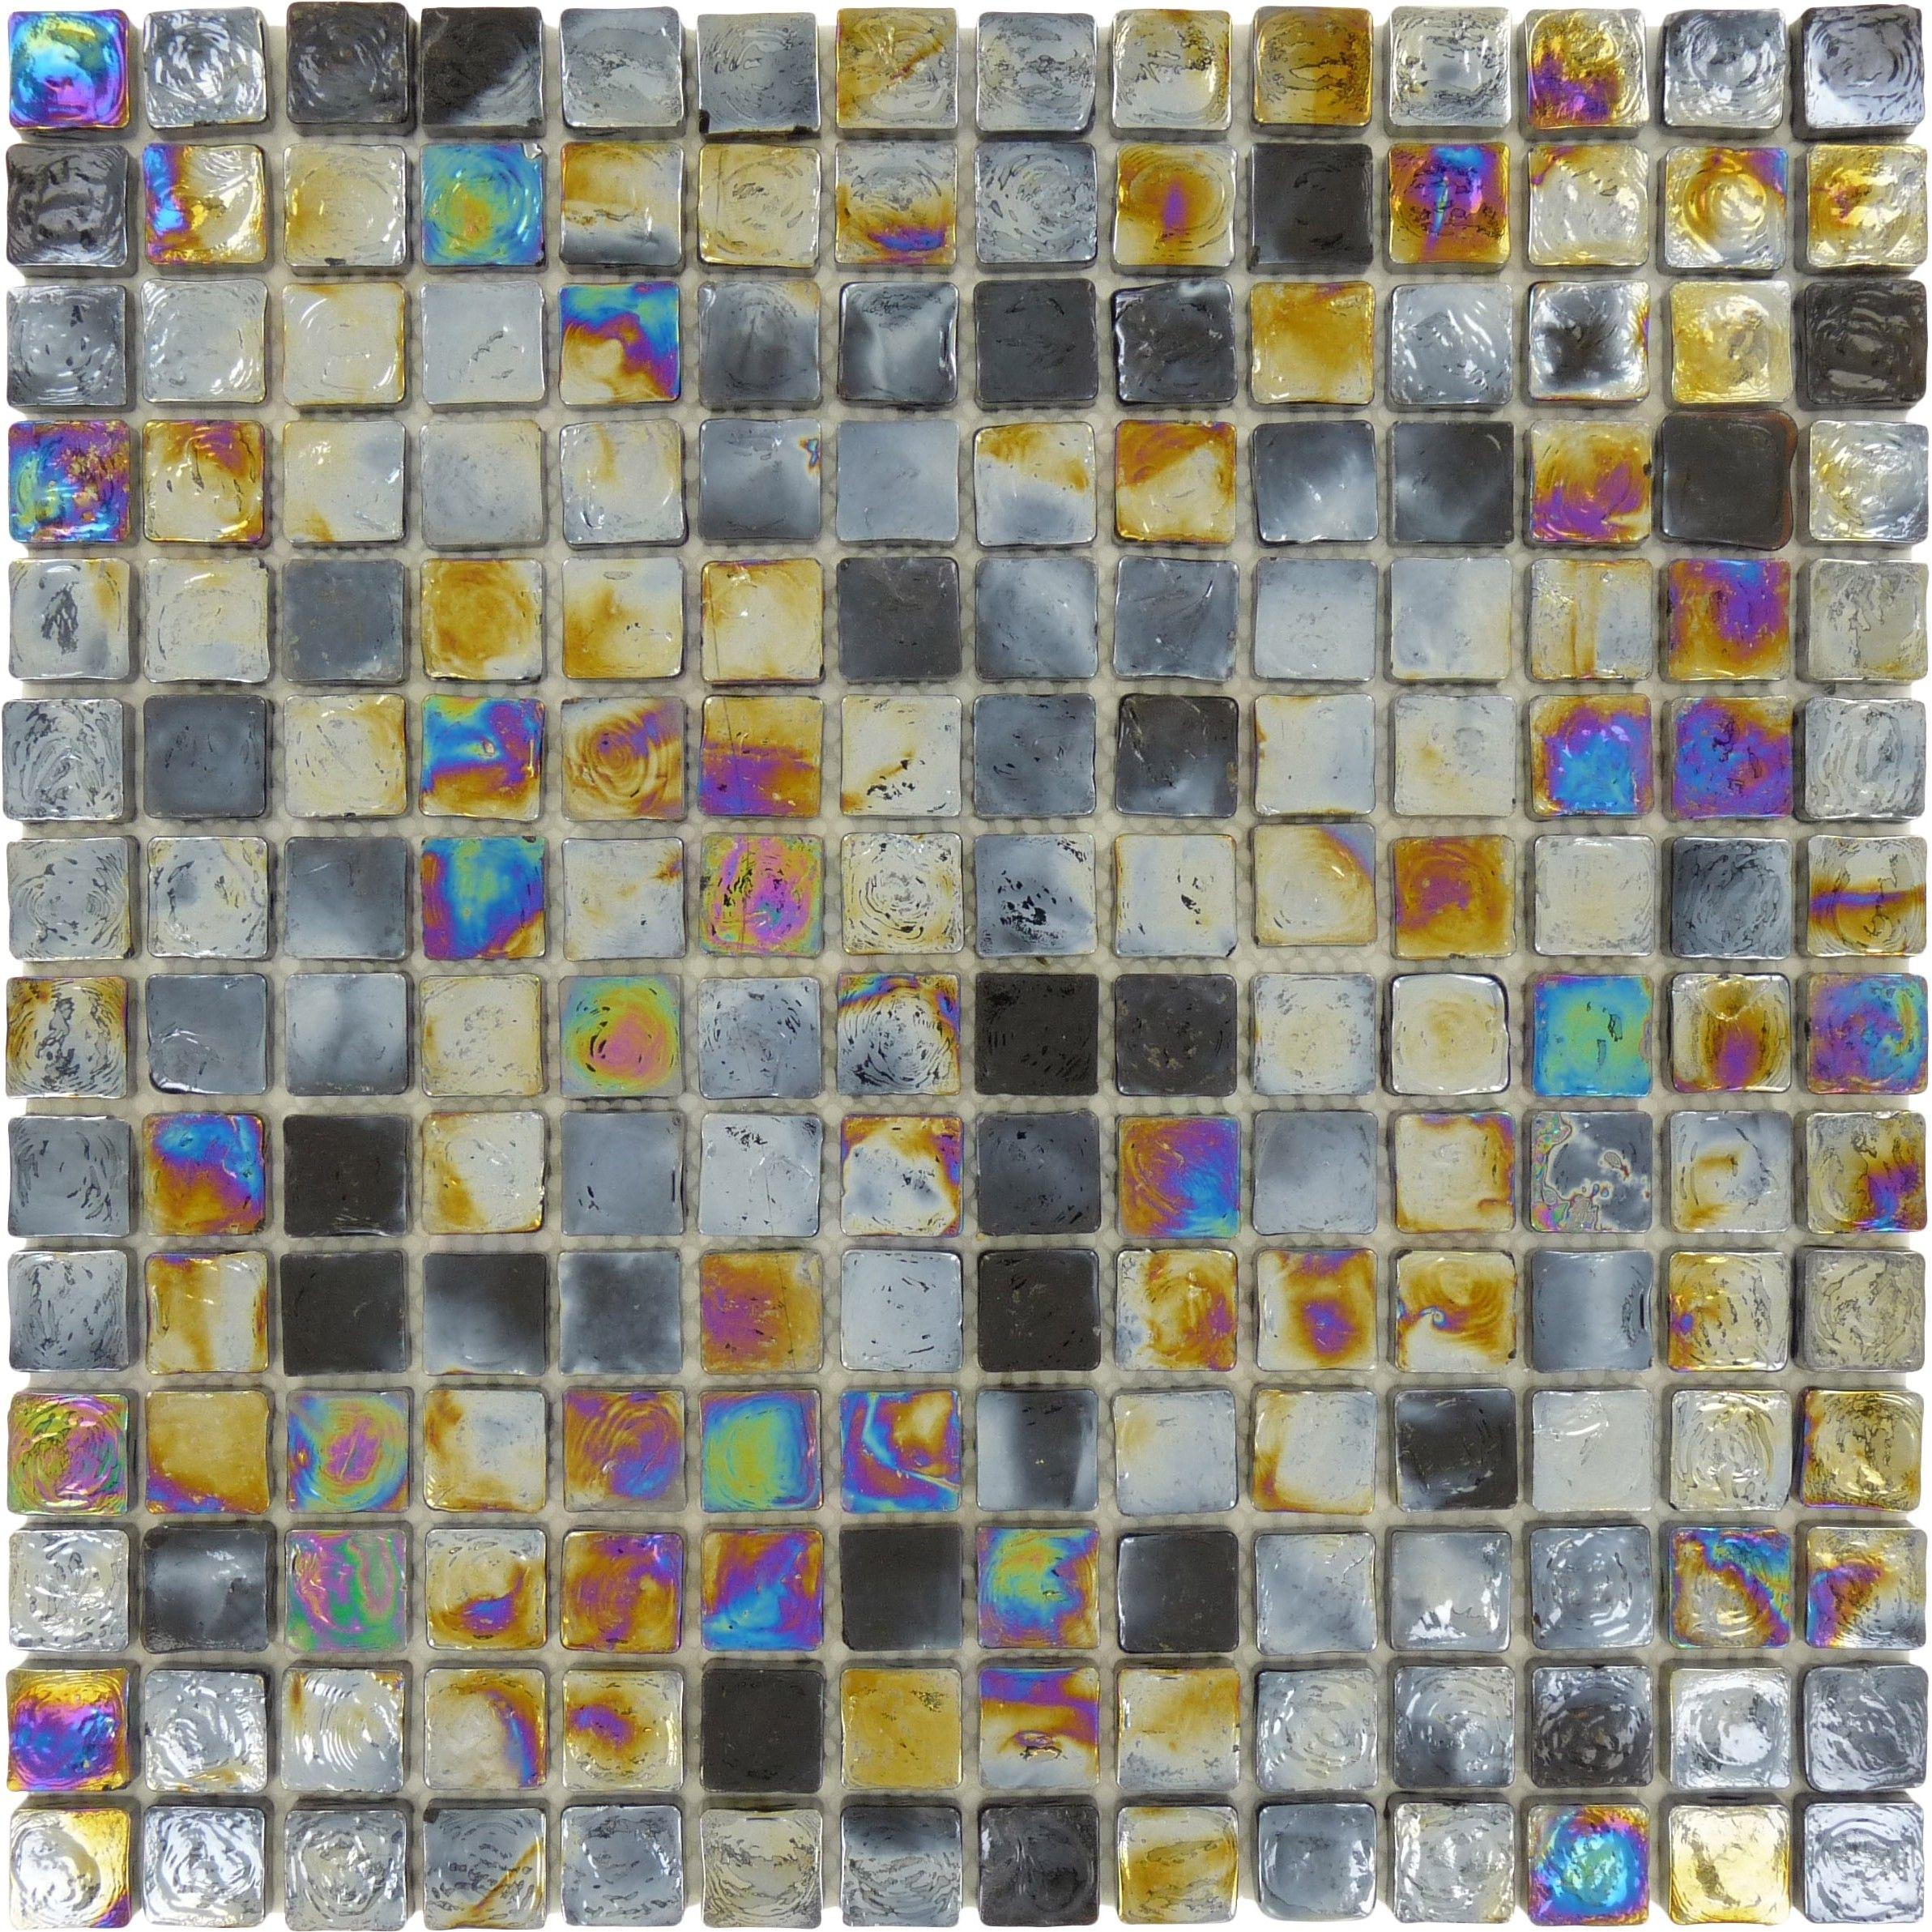 Sheet Size 12 X 12 Tile Size 3 4 X 3 4 Tiles Per Sheet 196 Tile Thickness 1 4 Grout Joints 1 Iridescent Tile Square Tile Black Glass